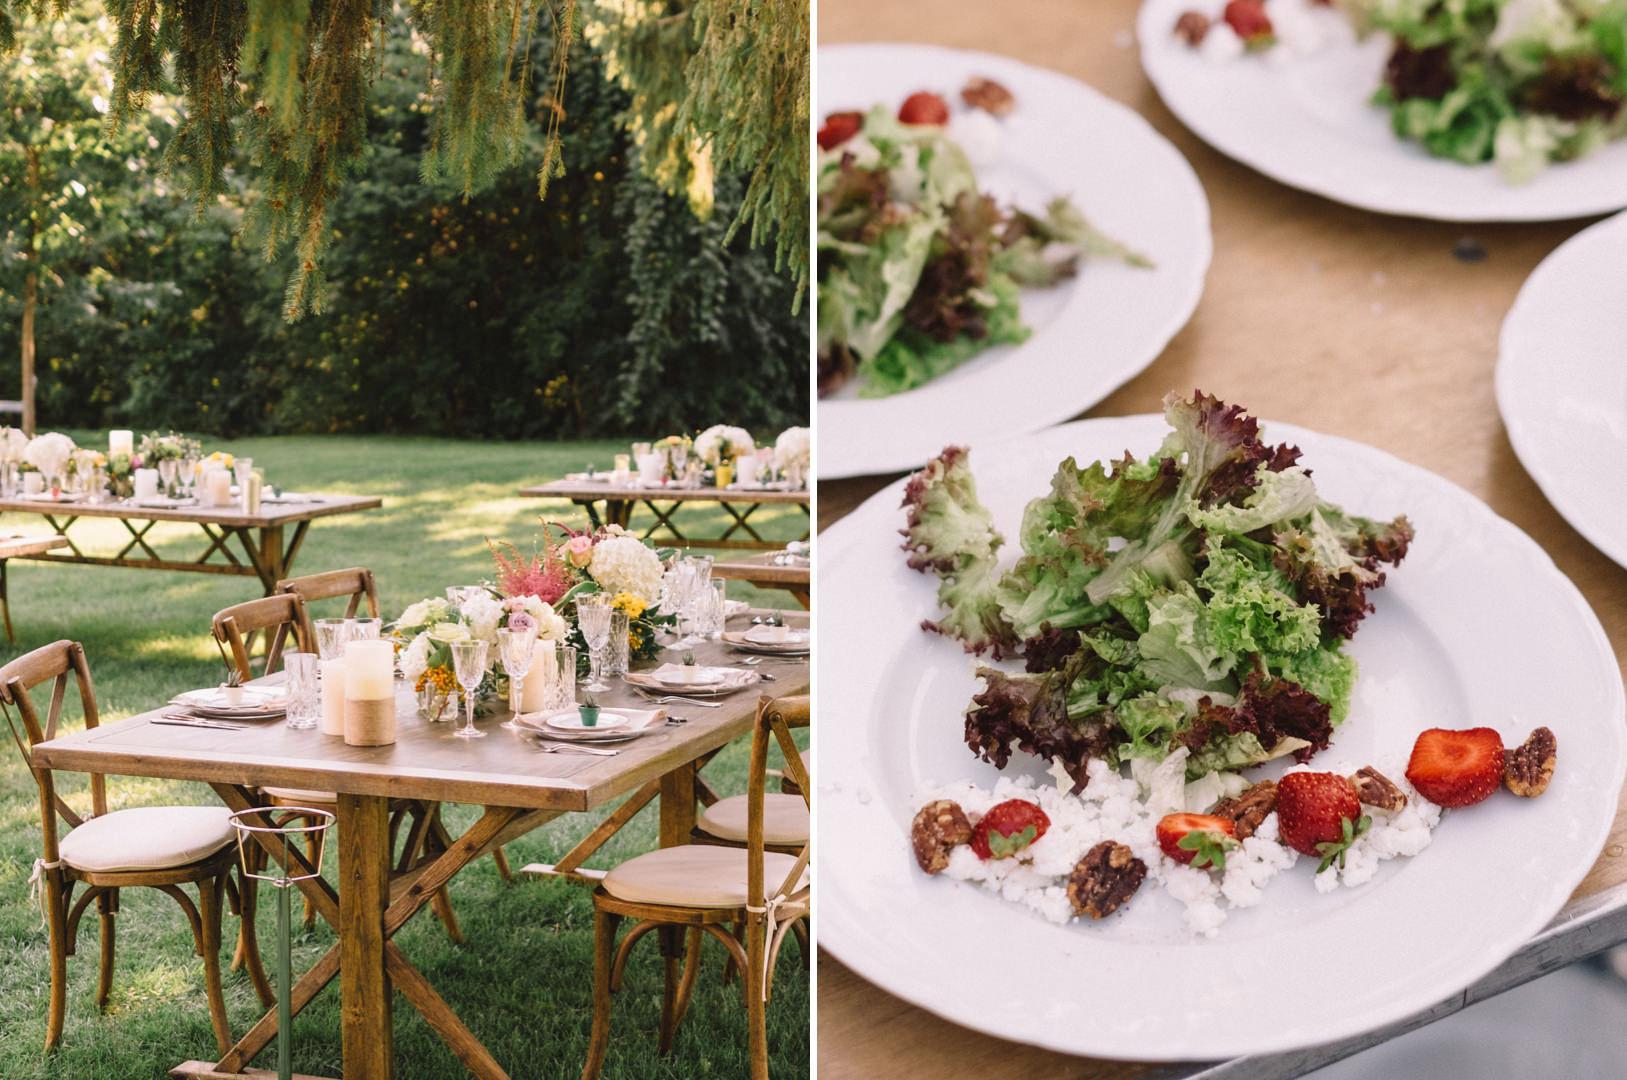 Chic montreal wedding at Fritz Farm by Micheal Beaulieu.jpg